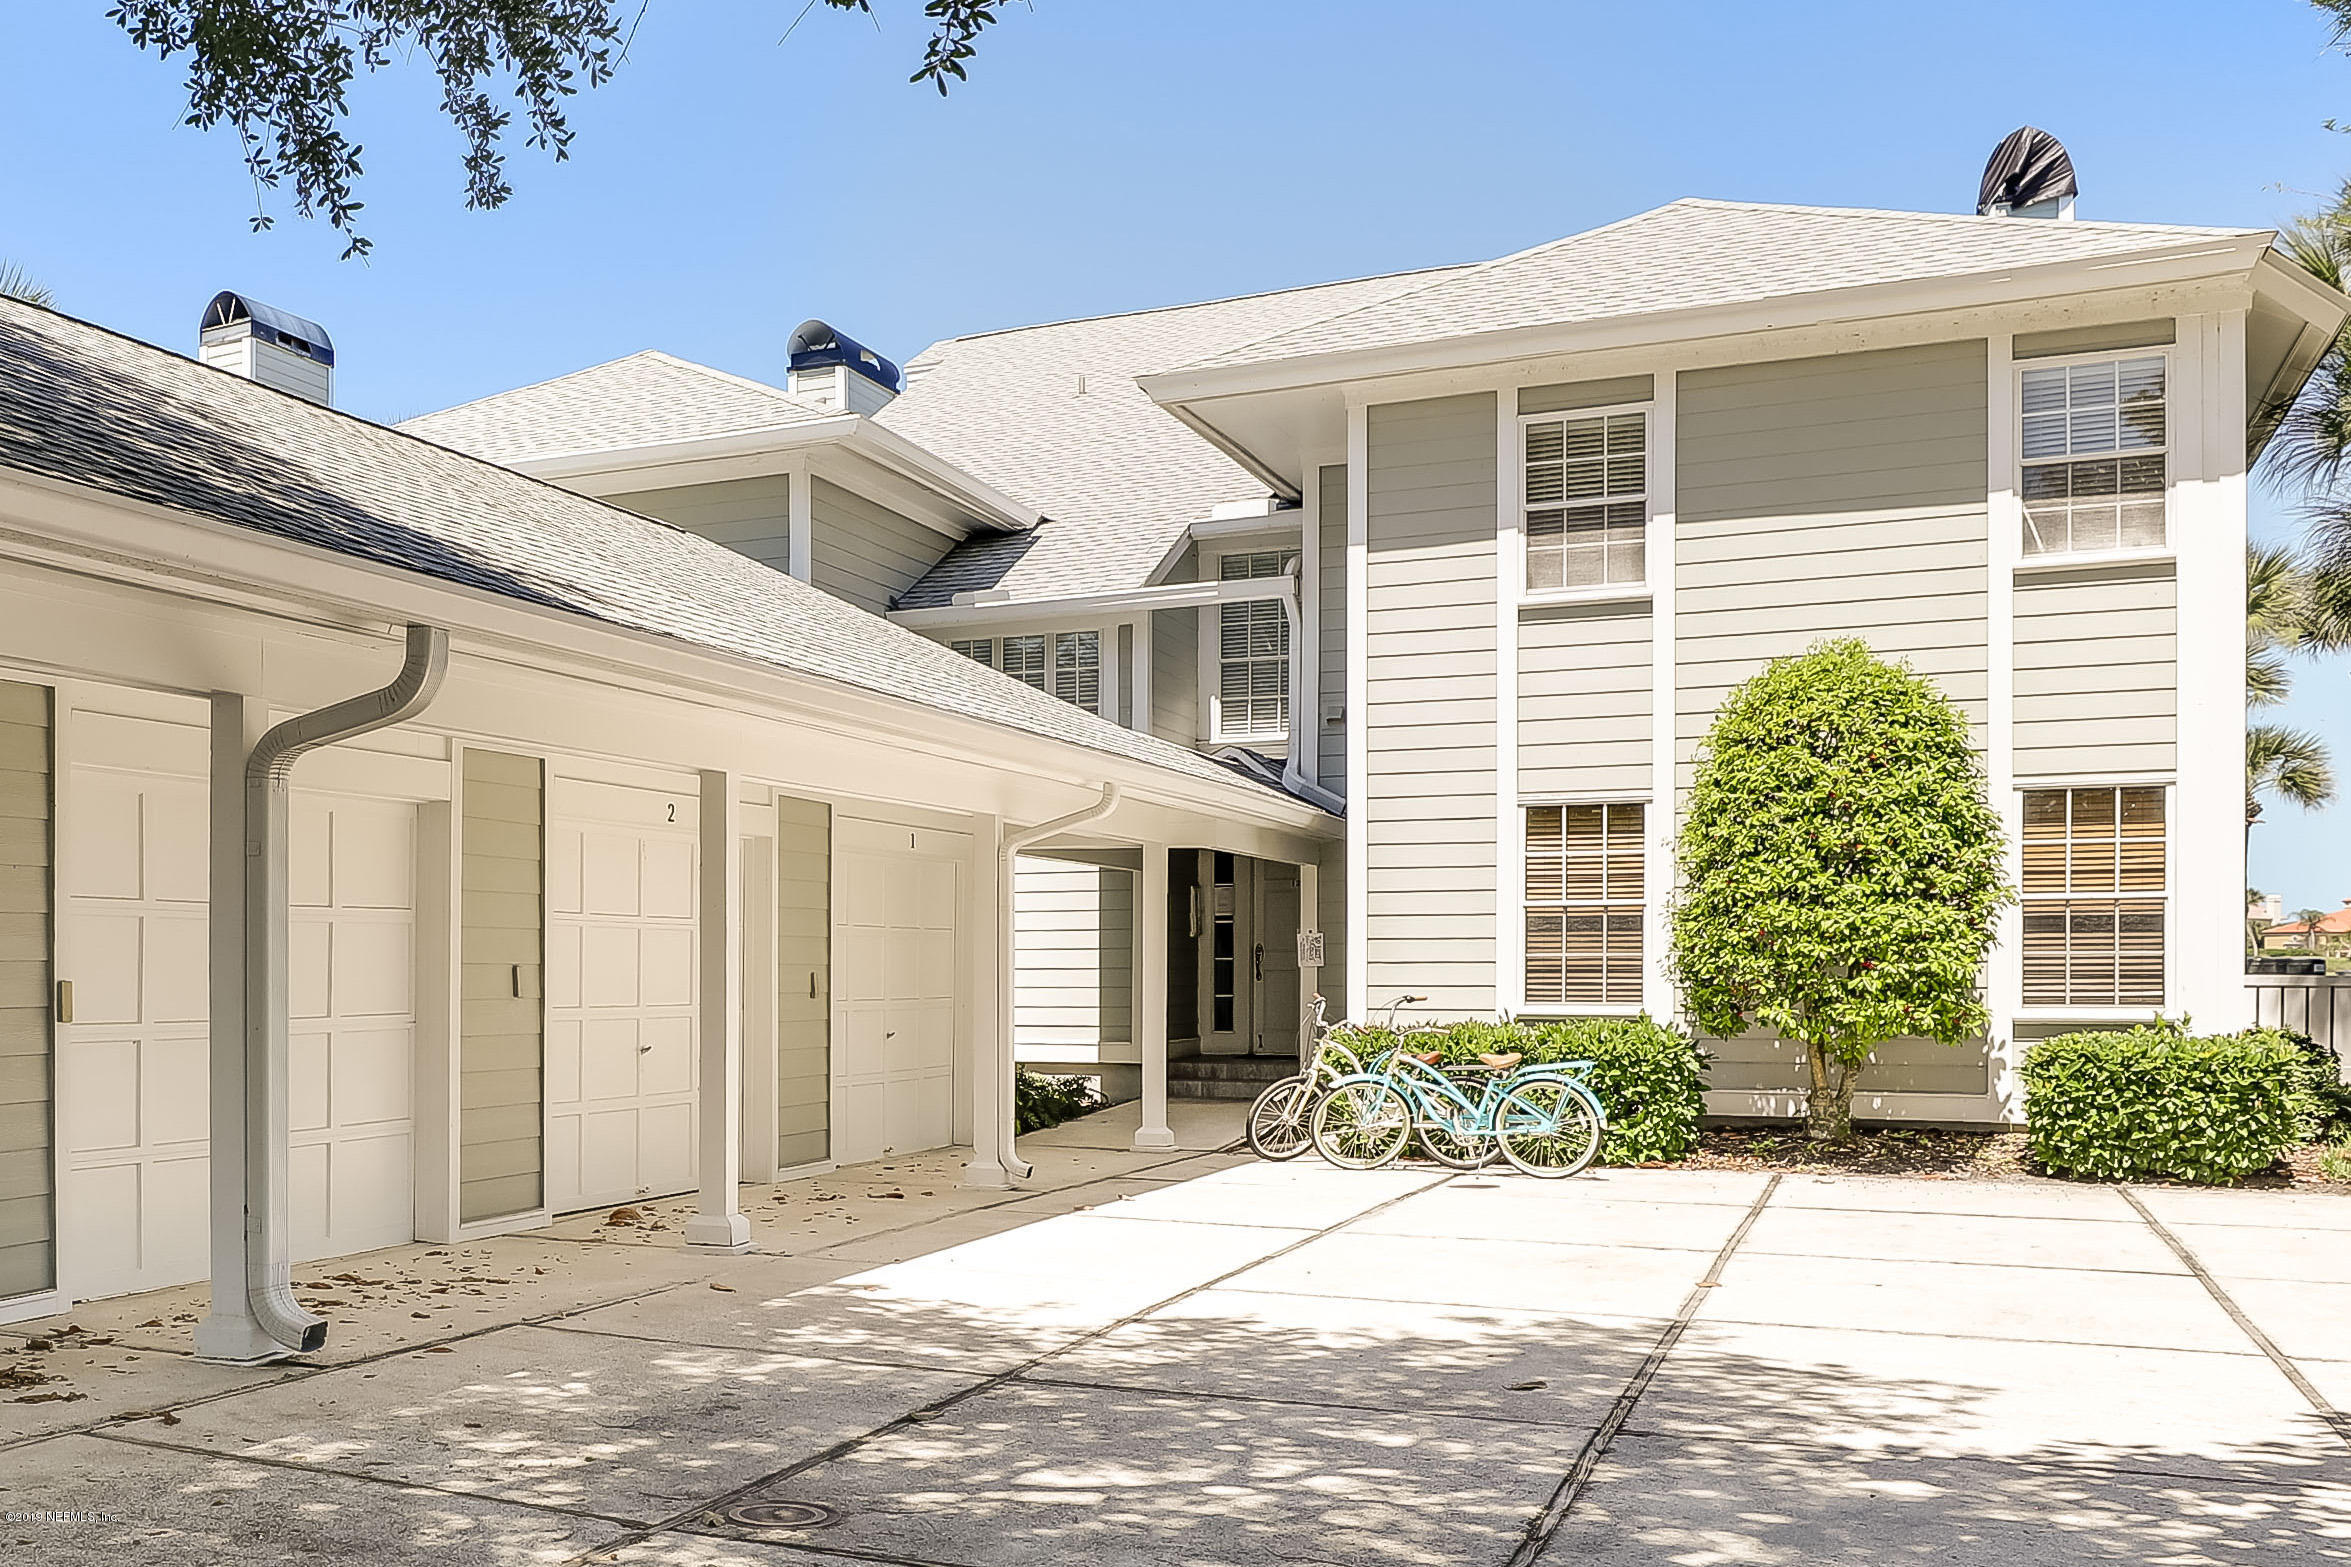 91 SAN JUAN, PONTE VEDRA BEACH, FLORIDA 32082, 3 Bedrooms Bedrooms, ,2 BathroomsBathrooms,Residential - condos/townhomes,For sale,SAN JUAN,990568